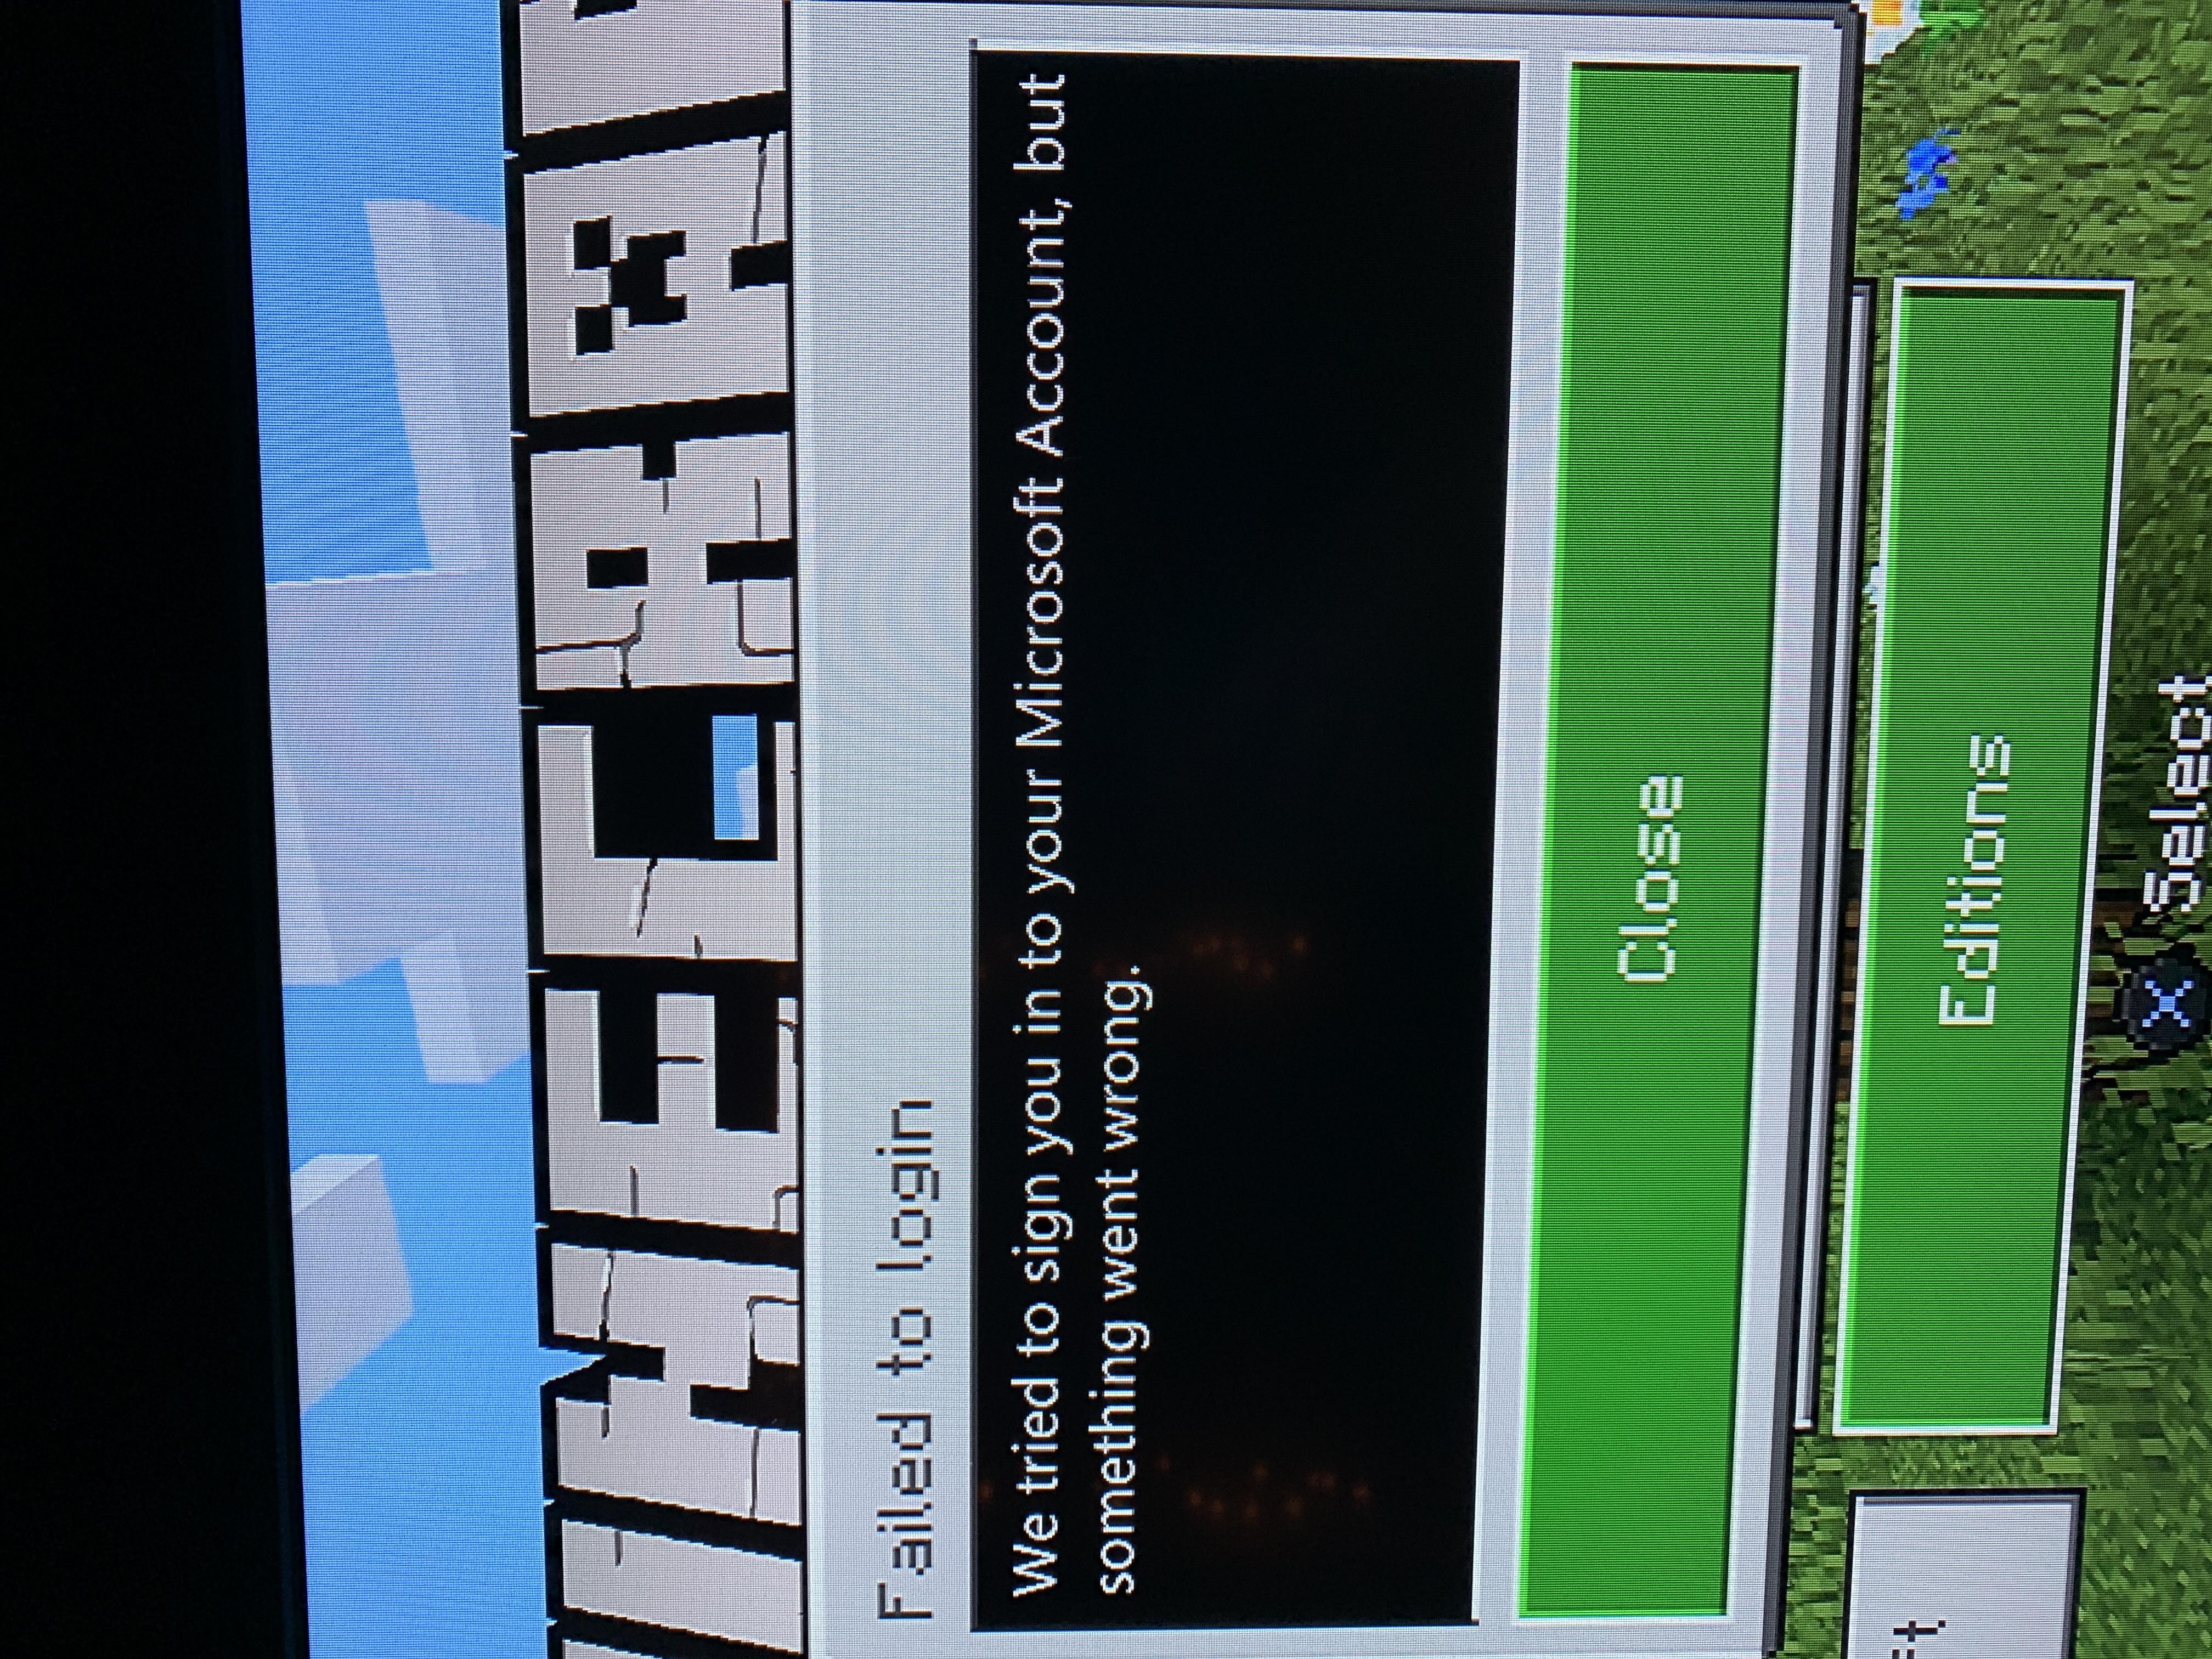 MCPE 61584 PS4 Bedrock Edition: Failed to login Jira